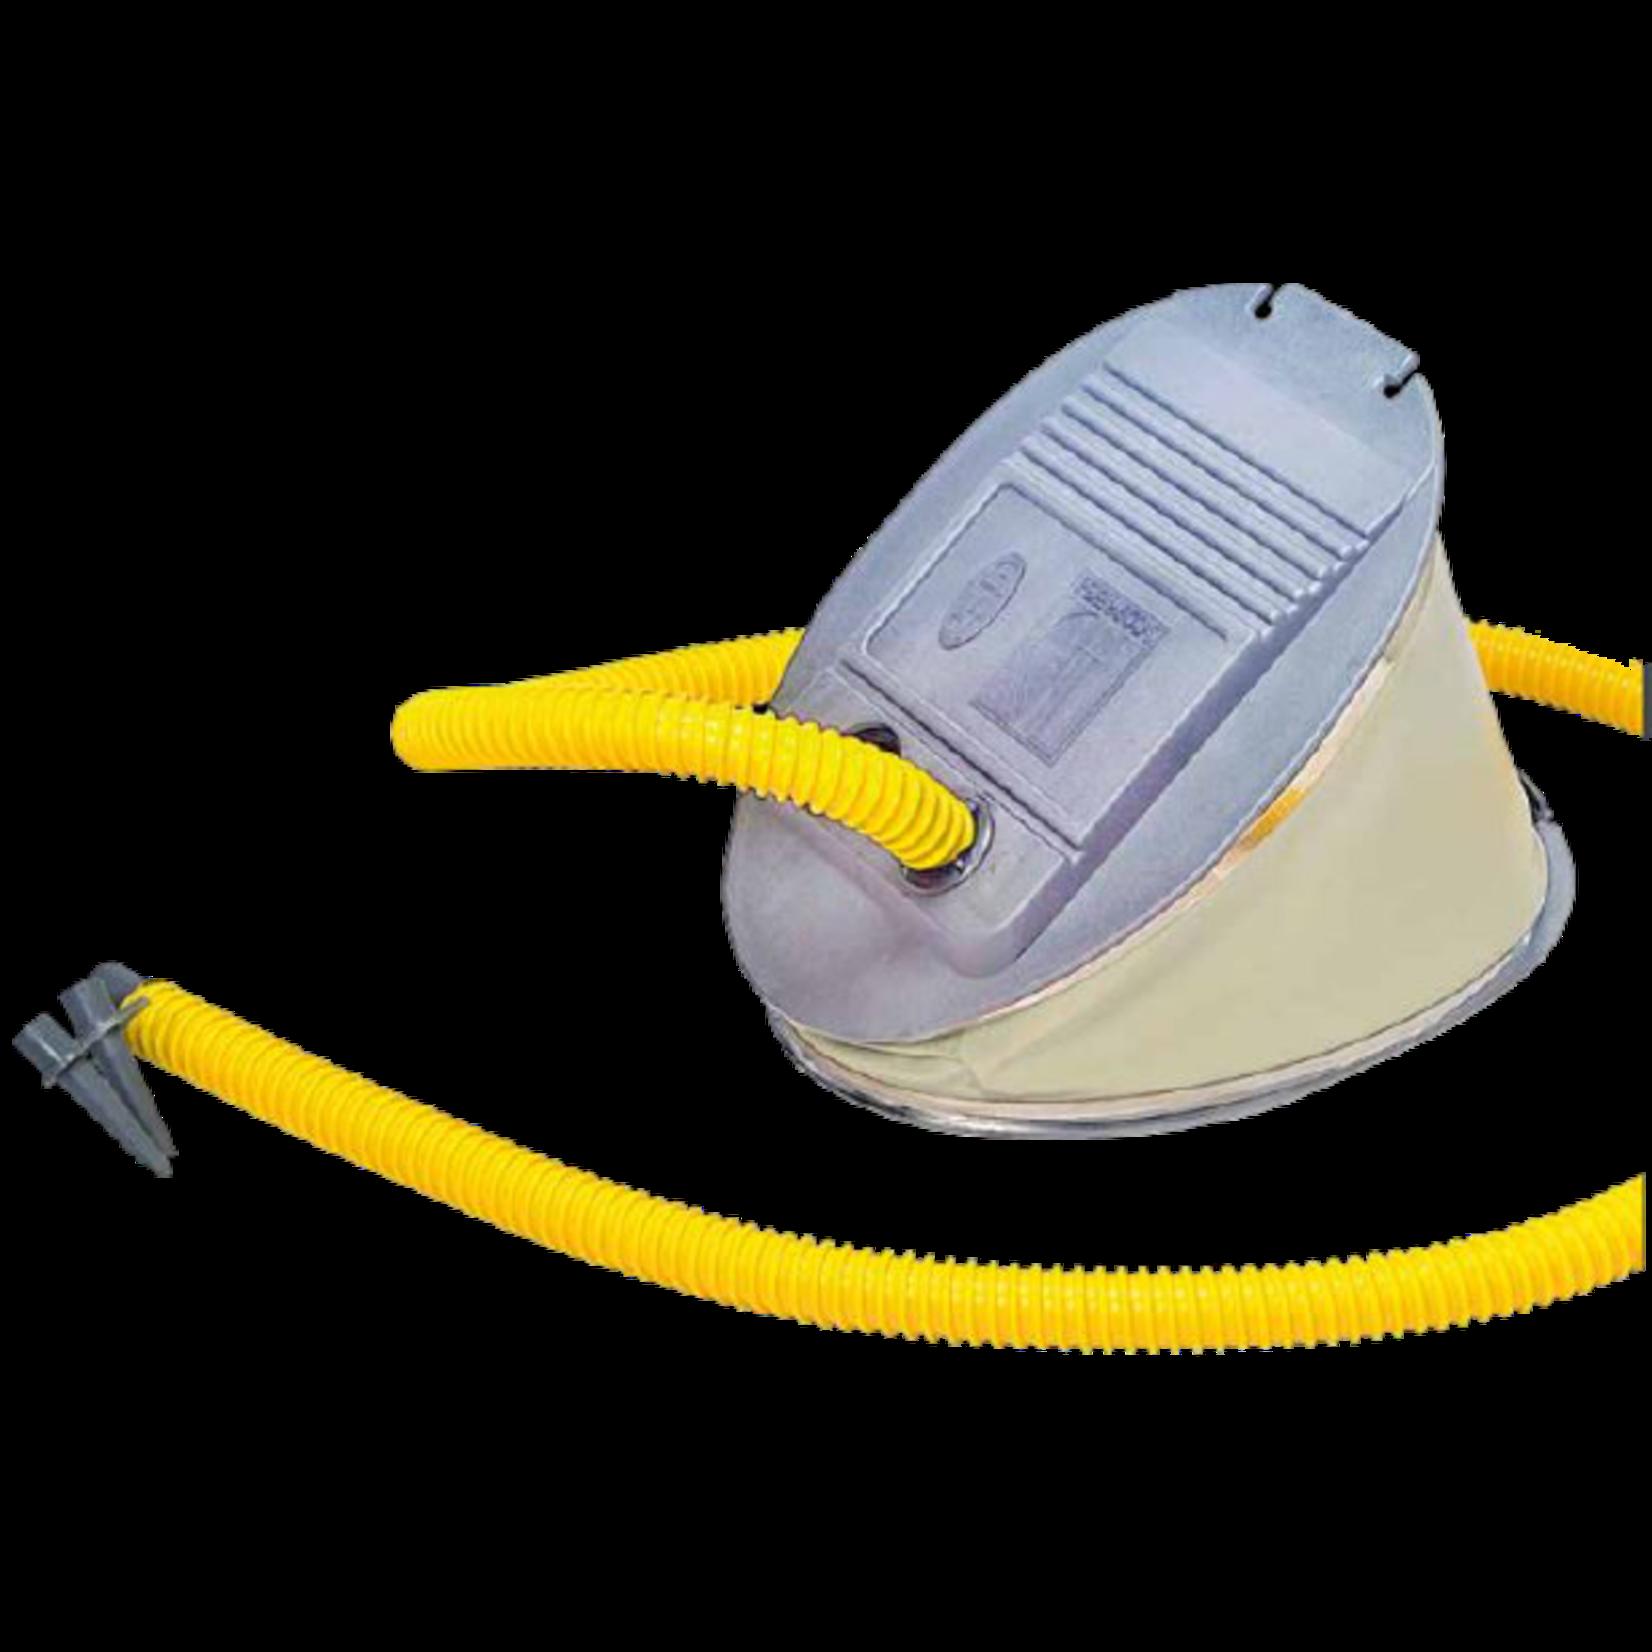 Scoprega Bravo GP 5 - footpump - up to 400 mbar - 5 liter